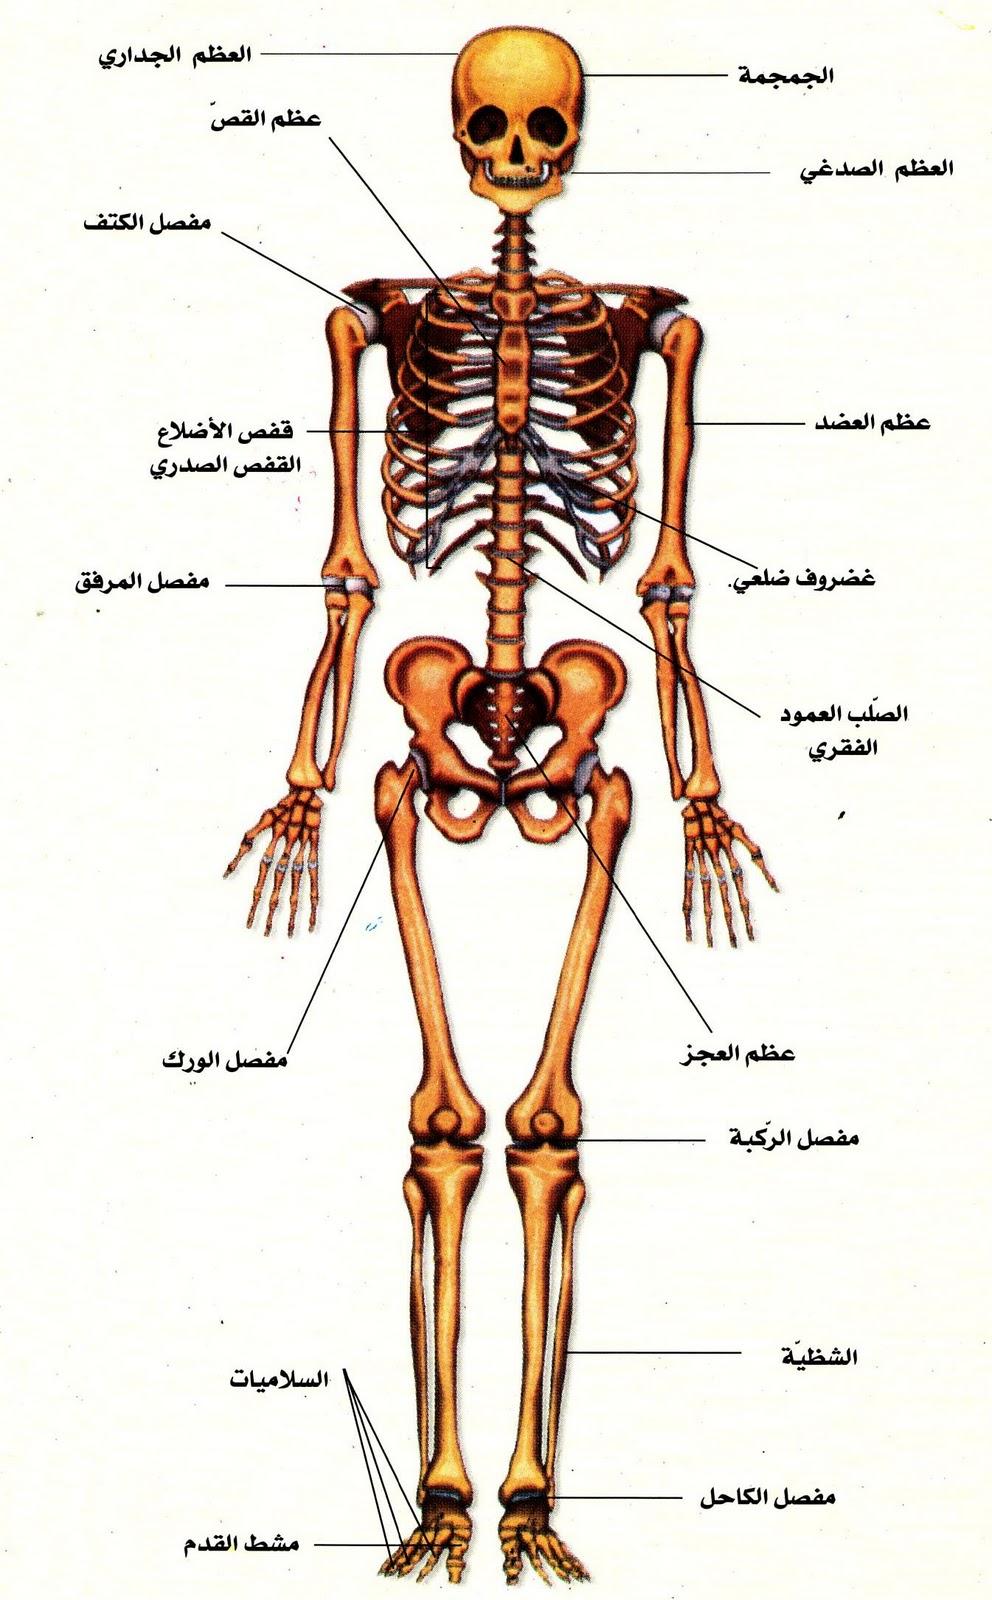 بالصور صور جسم الانسان , اروع صور لجسم الانسان 791 2